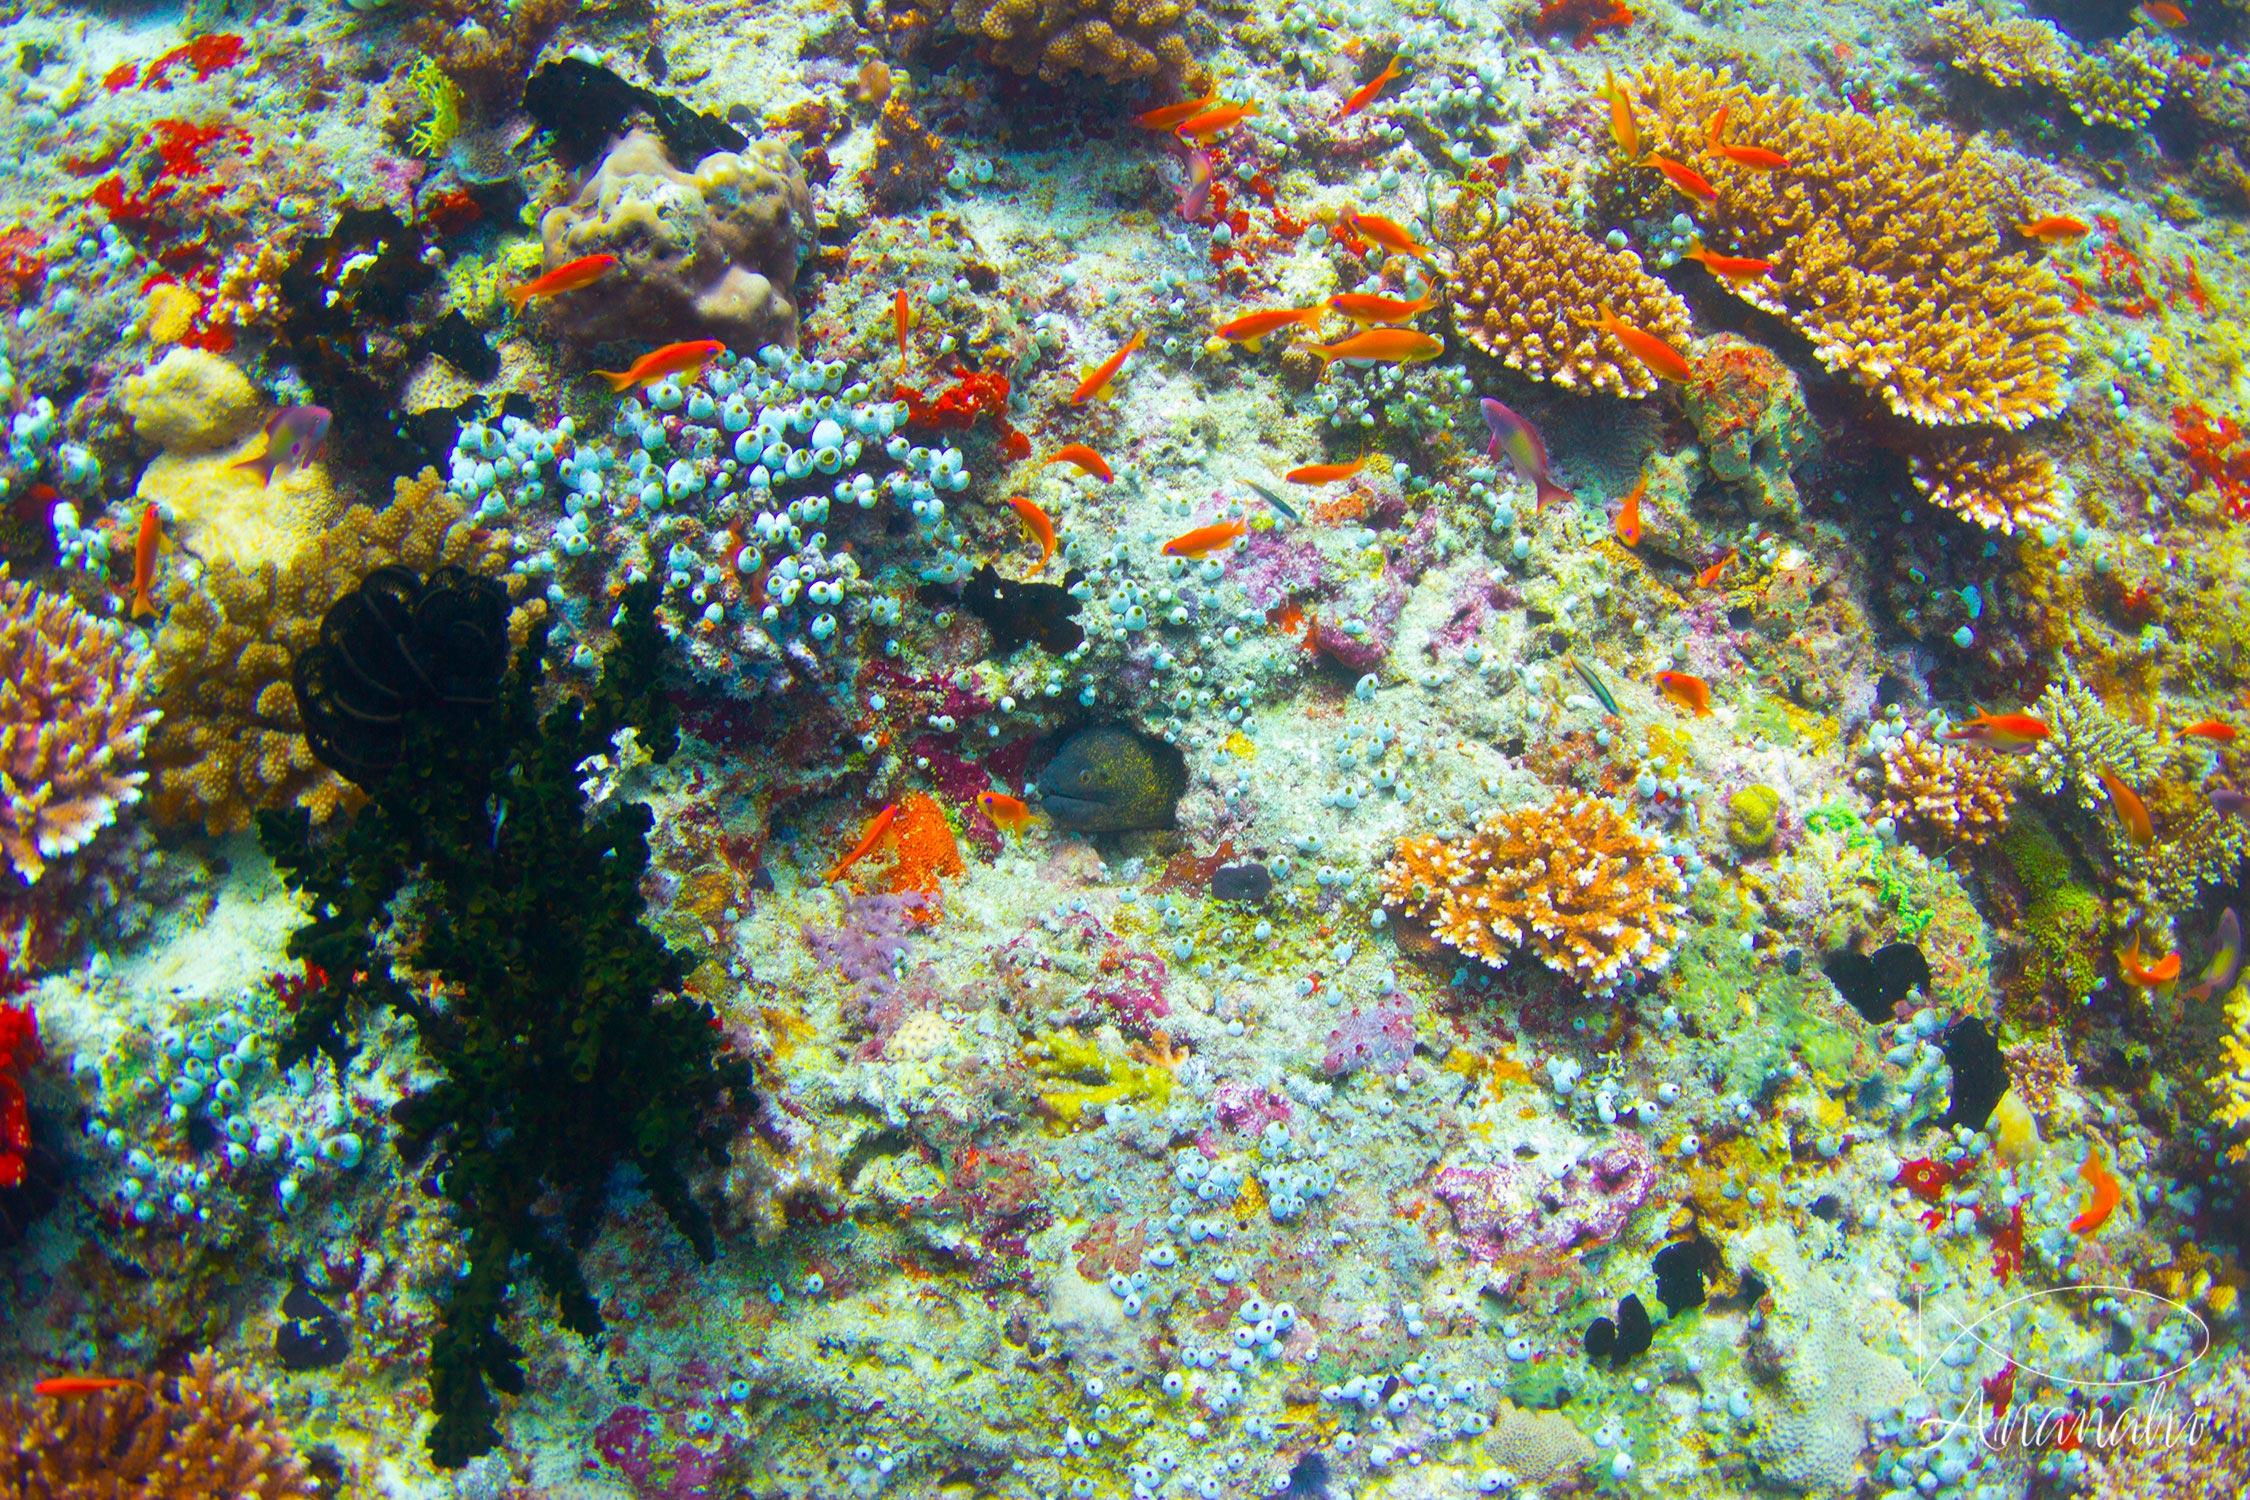 Yellow-edged moray of Maldives